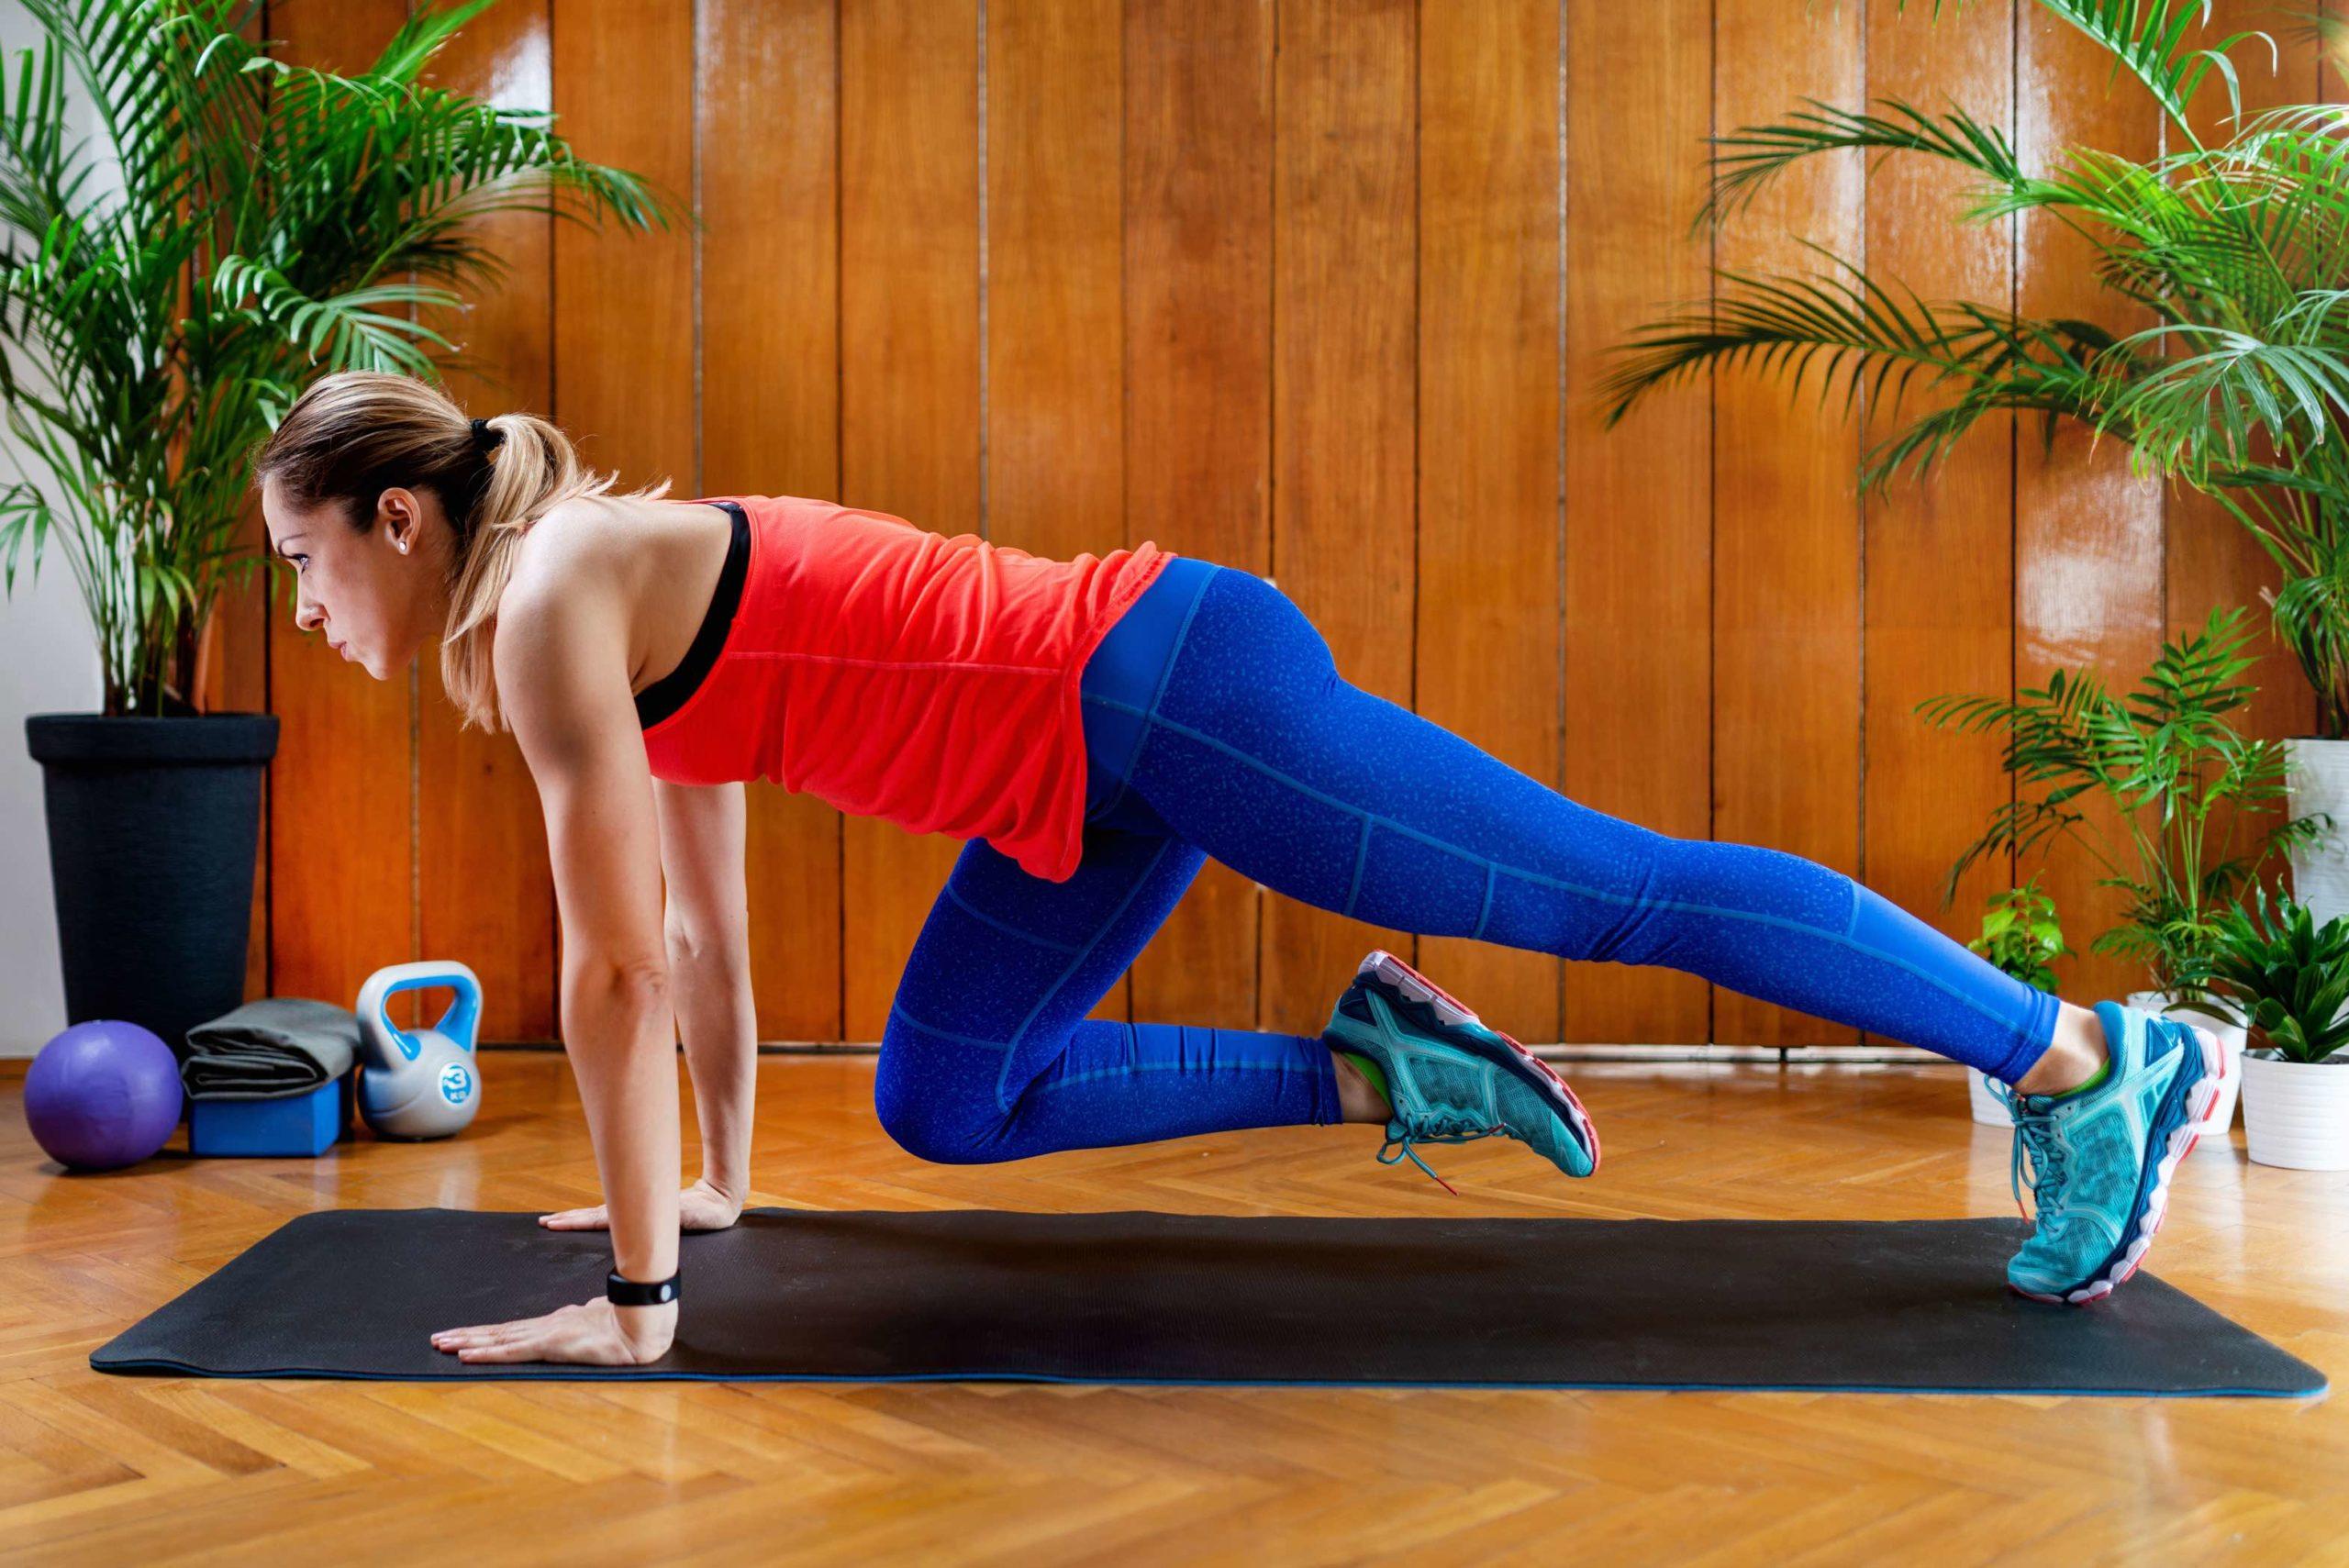 The best training tips for fitness beginners